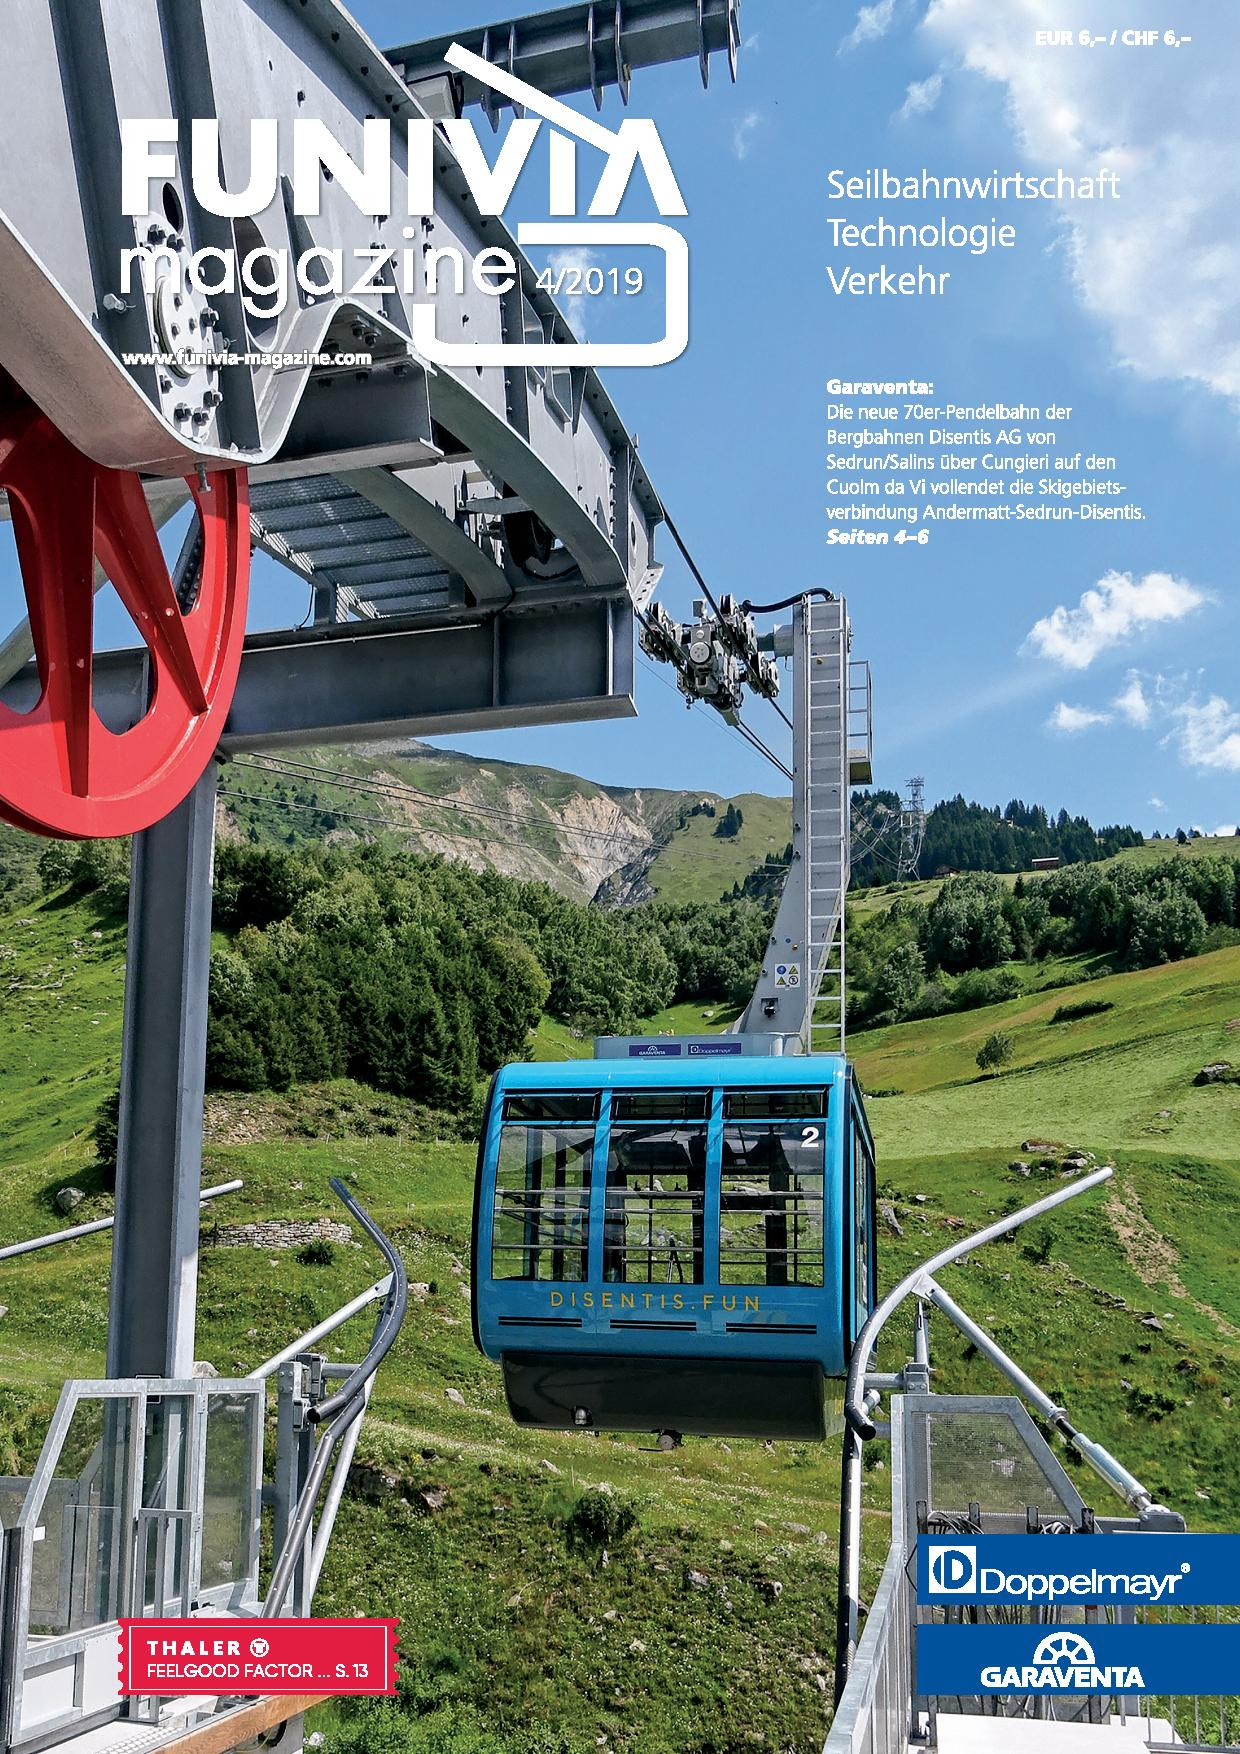 https://www.funivia-magazine.com/wp-content/uploads/2019/09/Funivia_IV_13.09_low.pdf